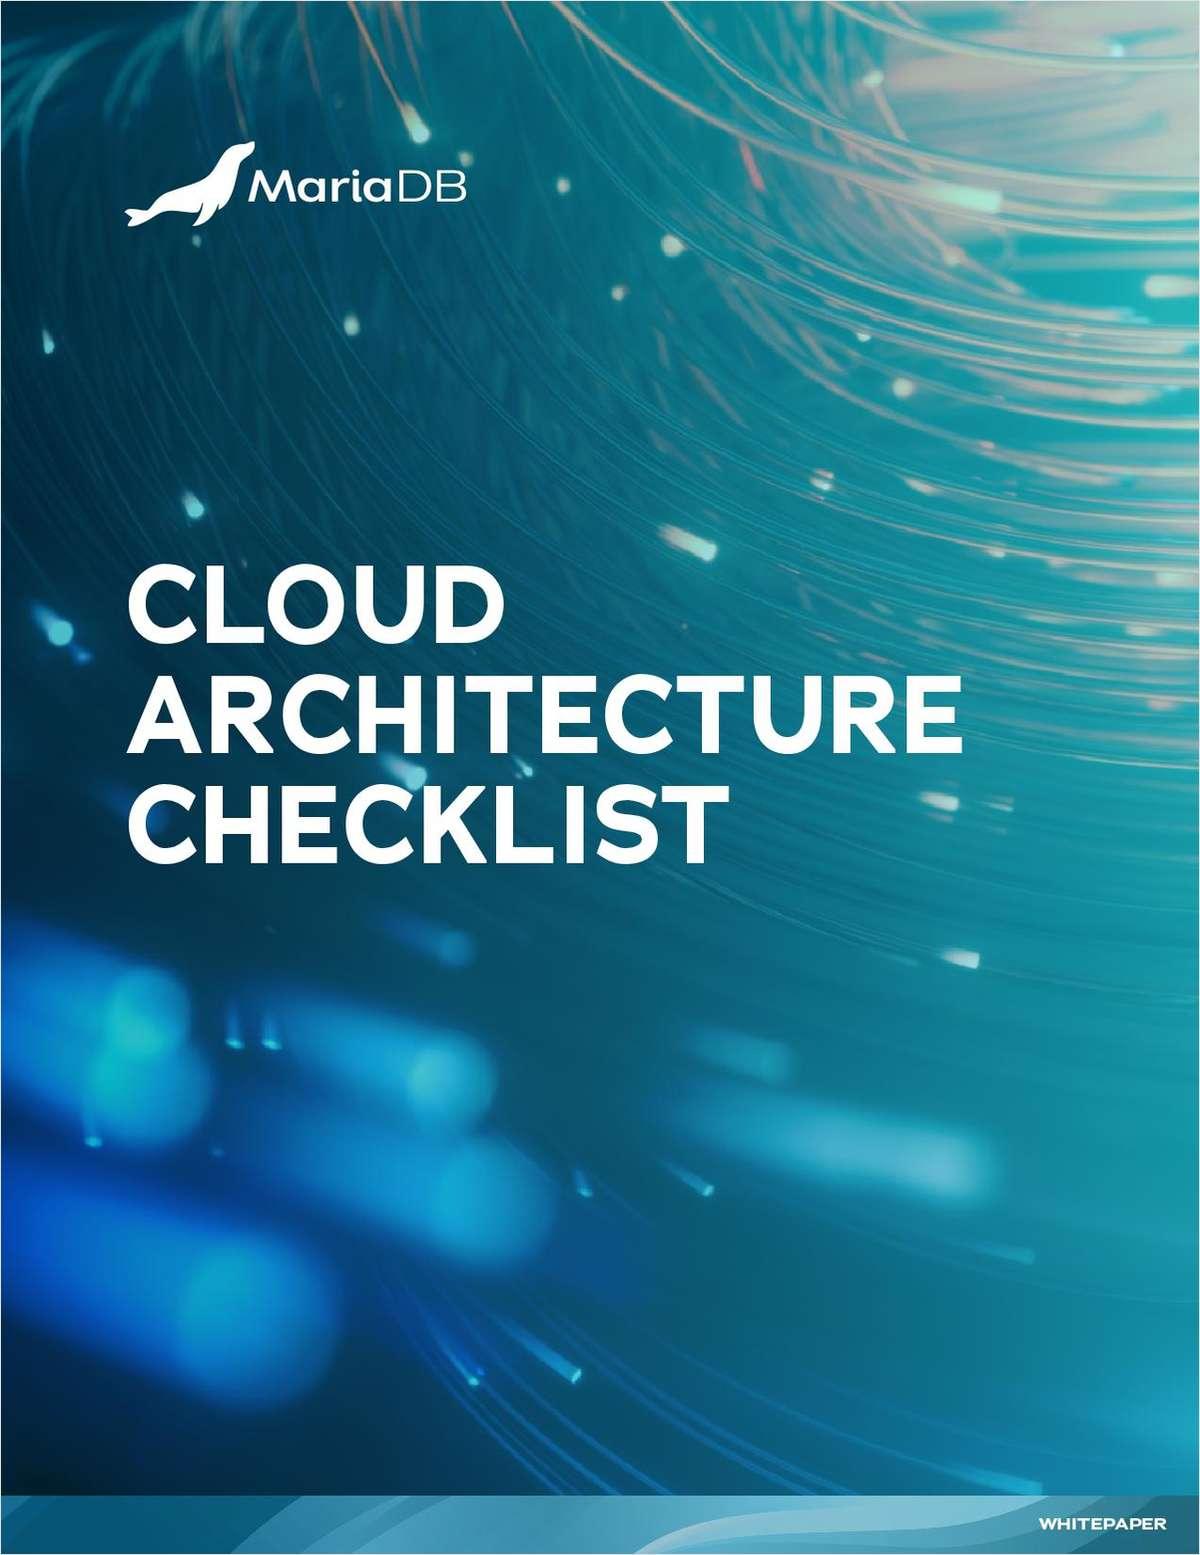 The Cloud Architecture Checklist